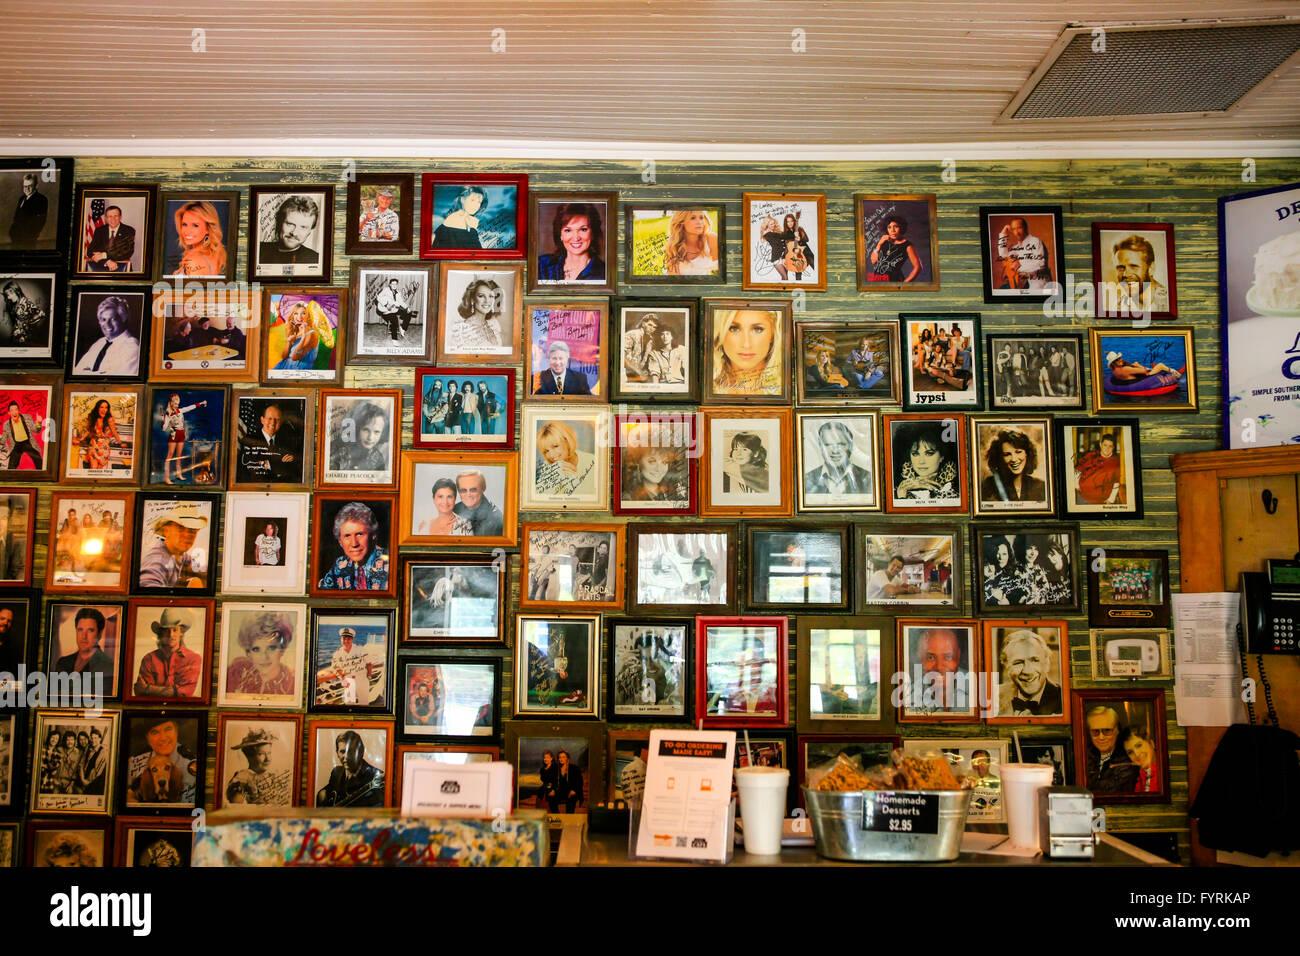 Signed celeb portraits on the walls inside the famous Loveless Cafe on Hwy 100, Nashville, TN - Stock Image